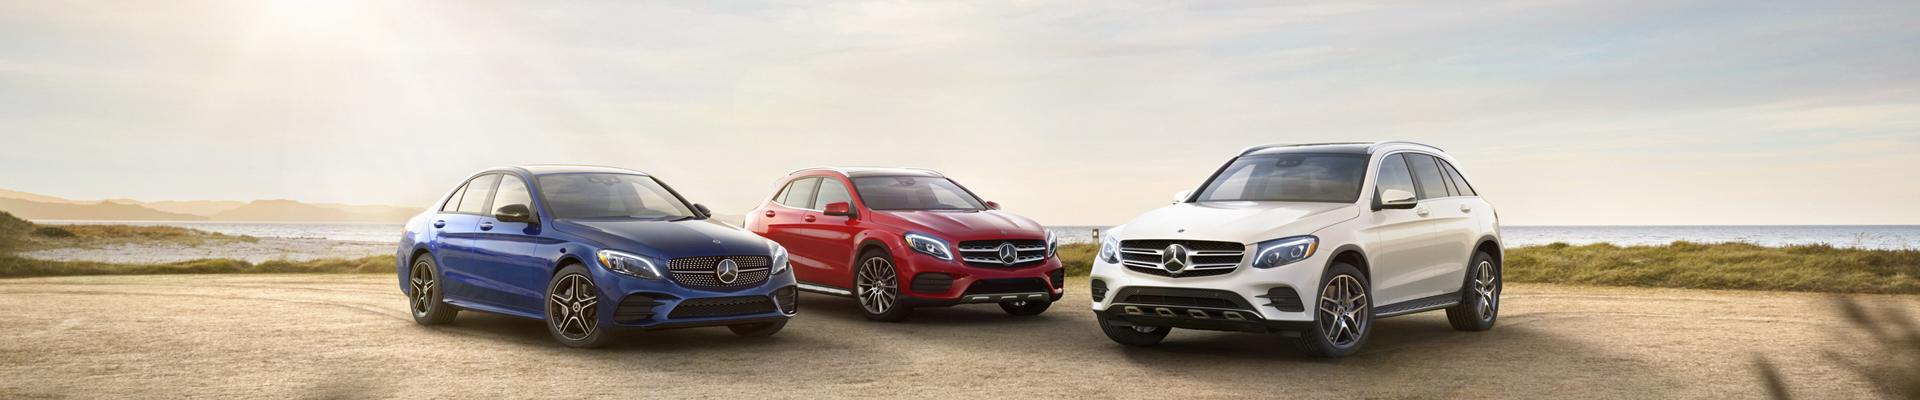 Mercedes-Benz of Massapequa Private Sales Event